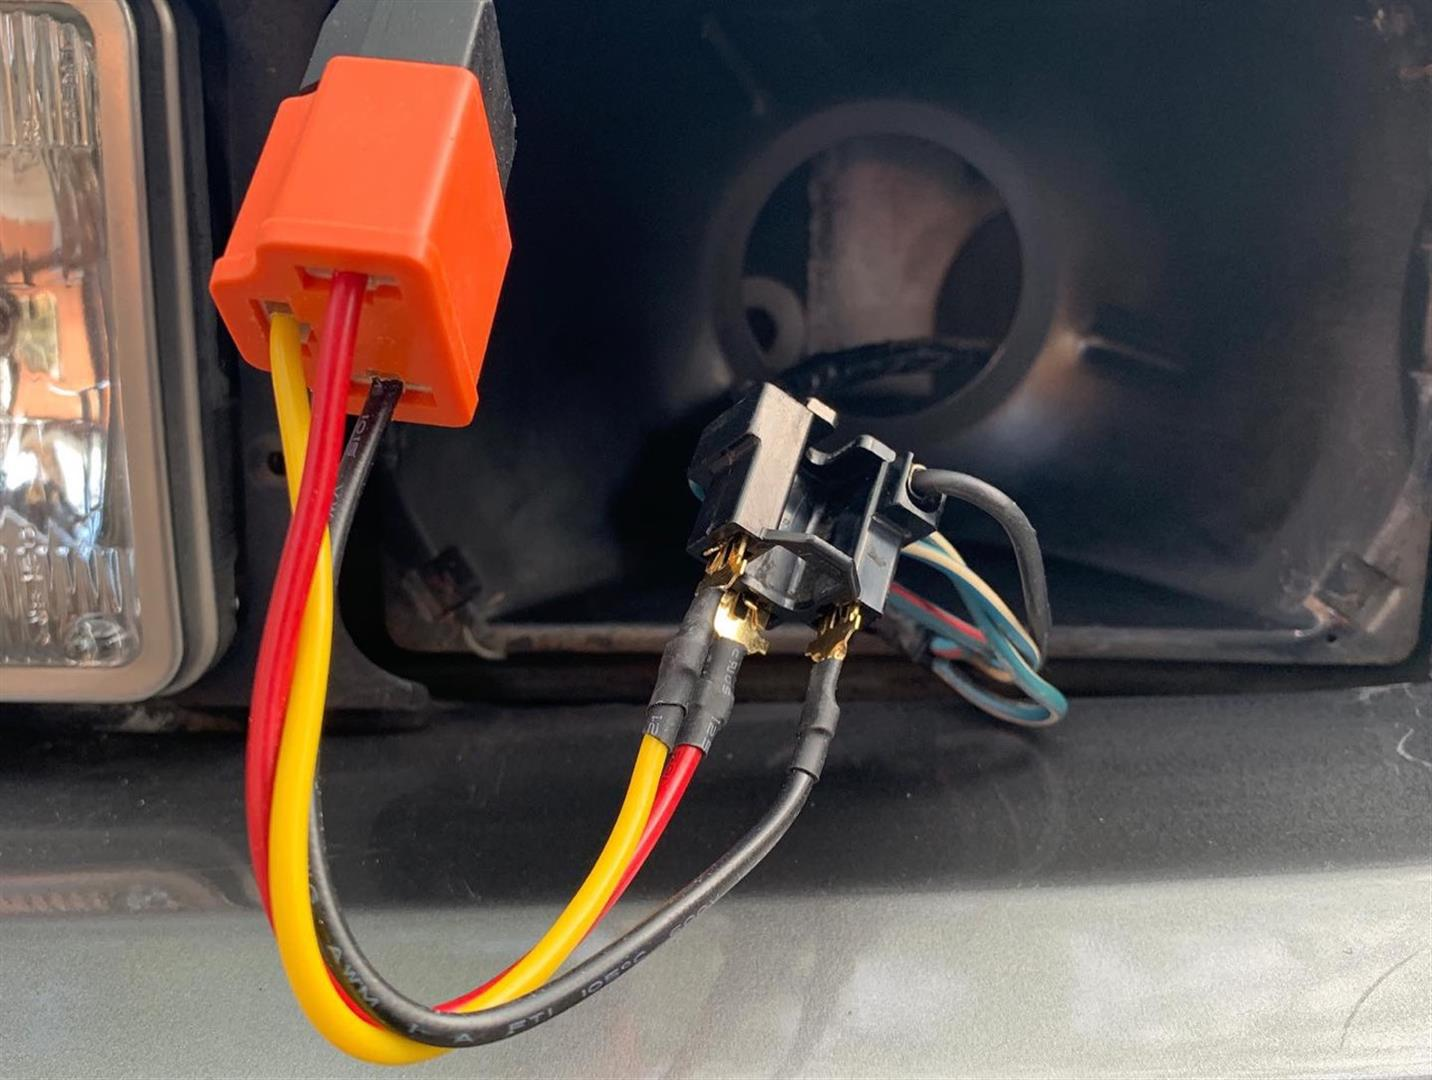 Wiring adapter fix | DMC10515.com